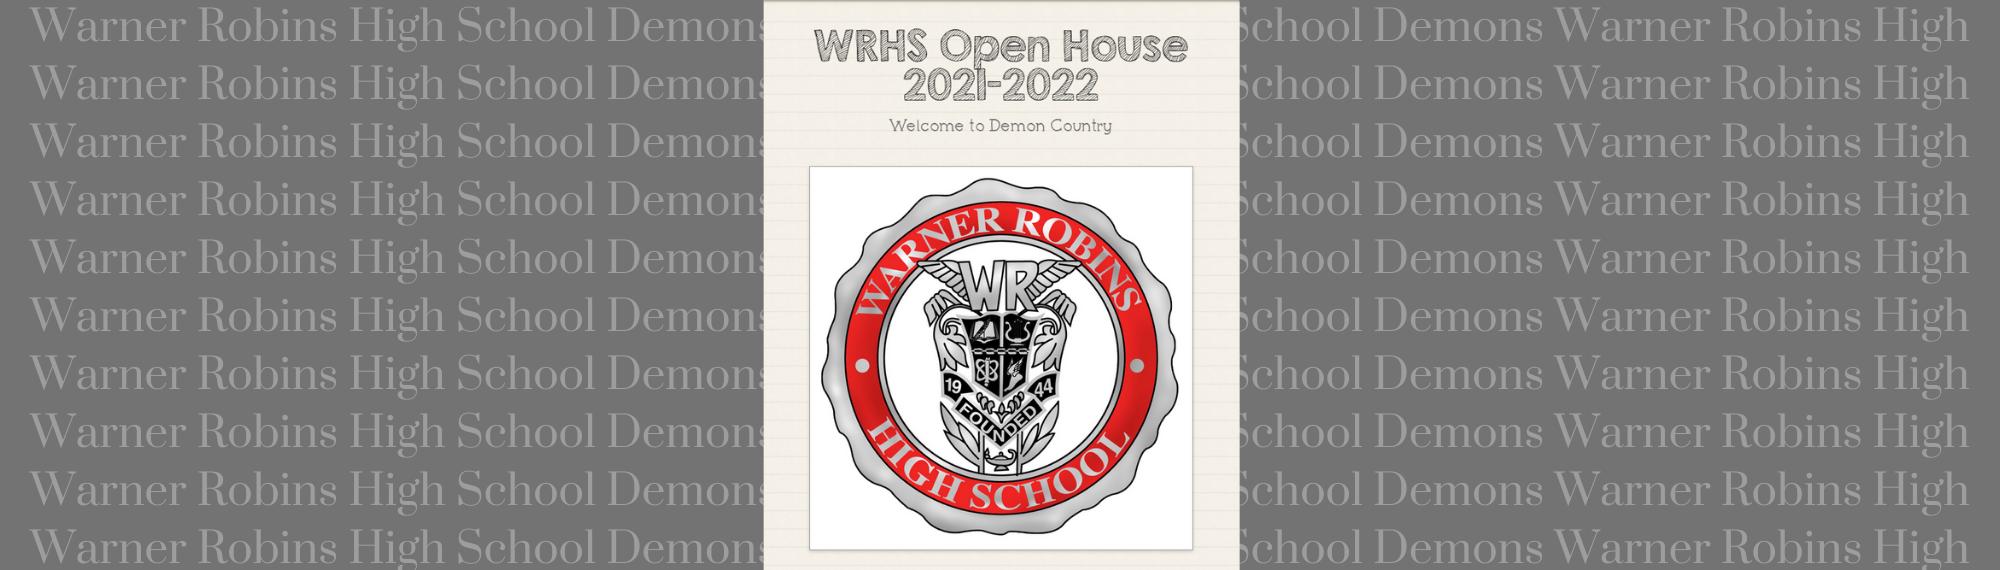 2021 Virtual Open House Newsletter